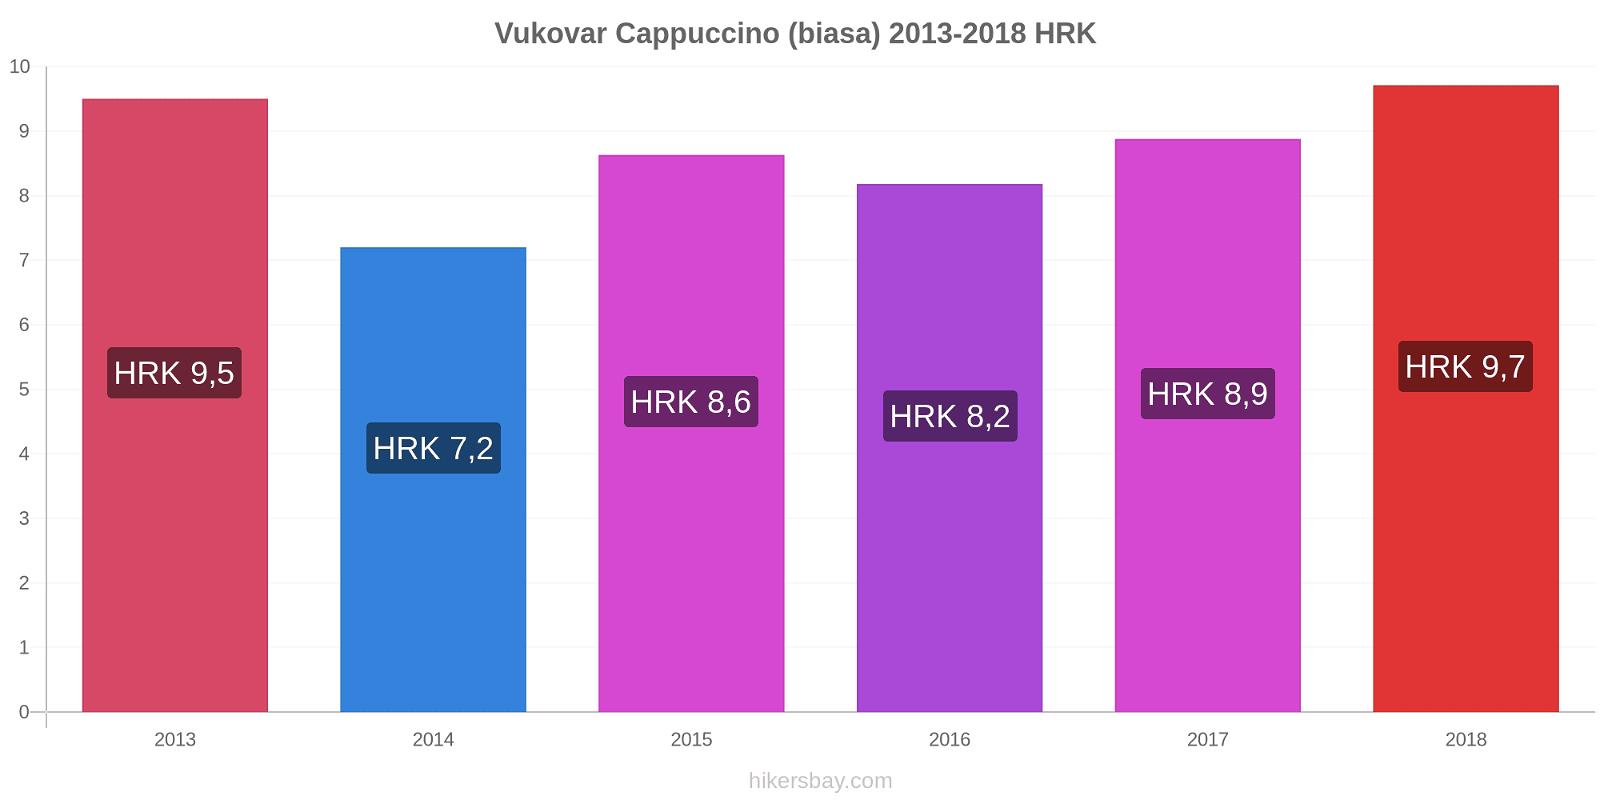 Vukovar perubahan harga Cappuccino (biasa) hikersbay.com